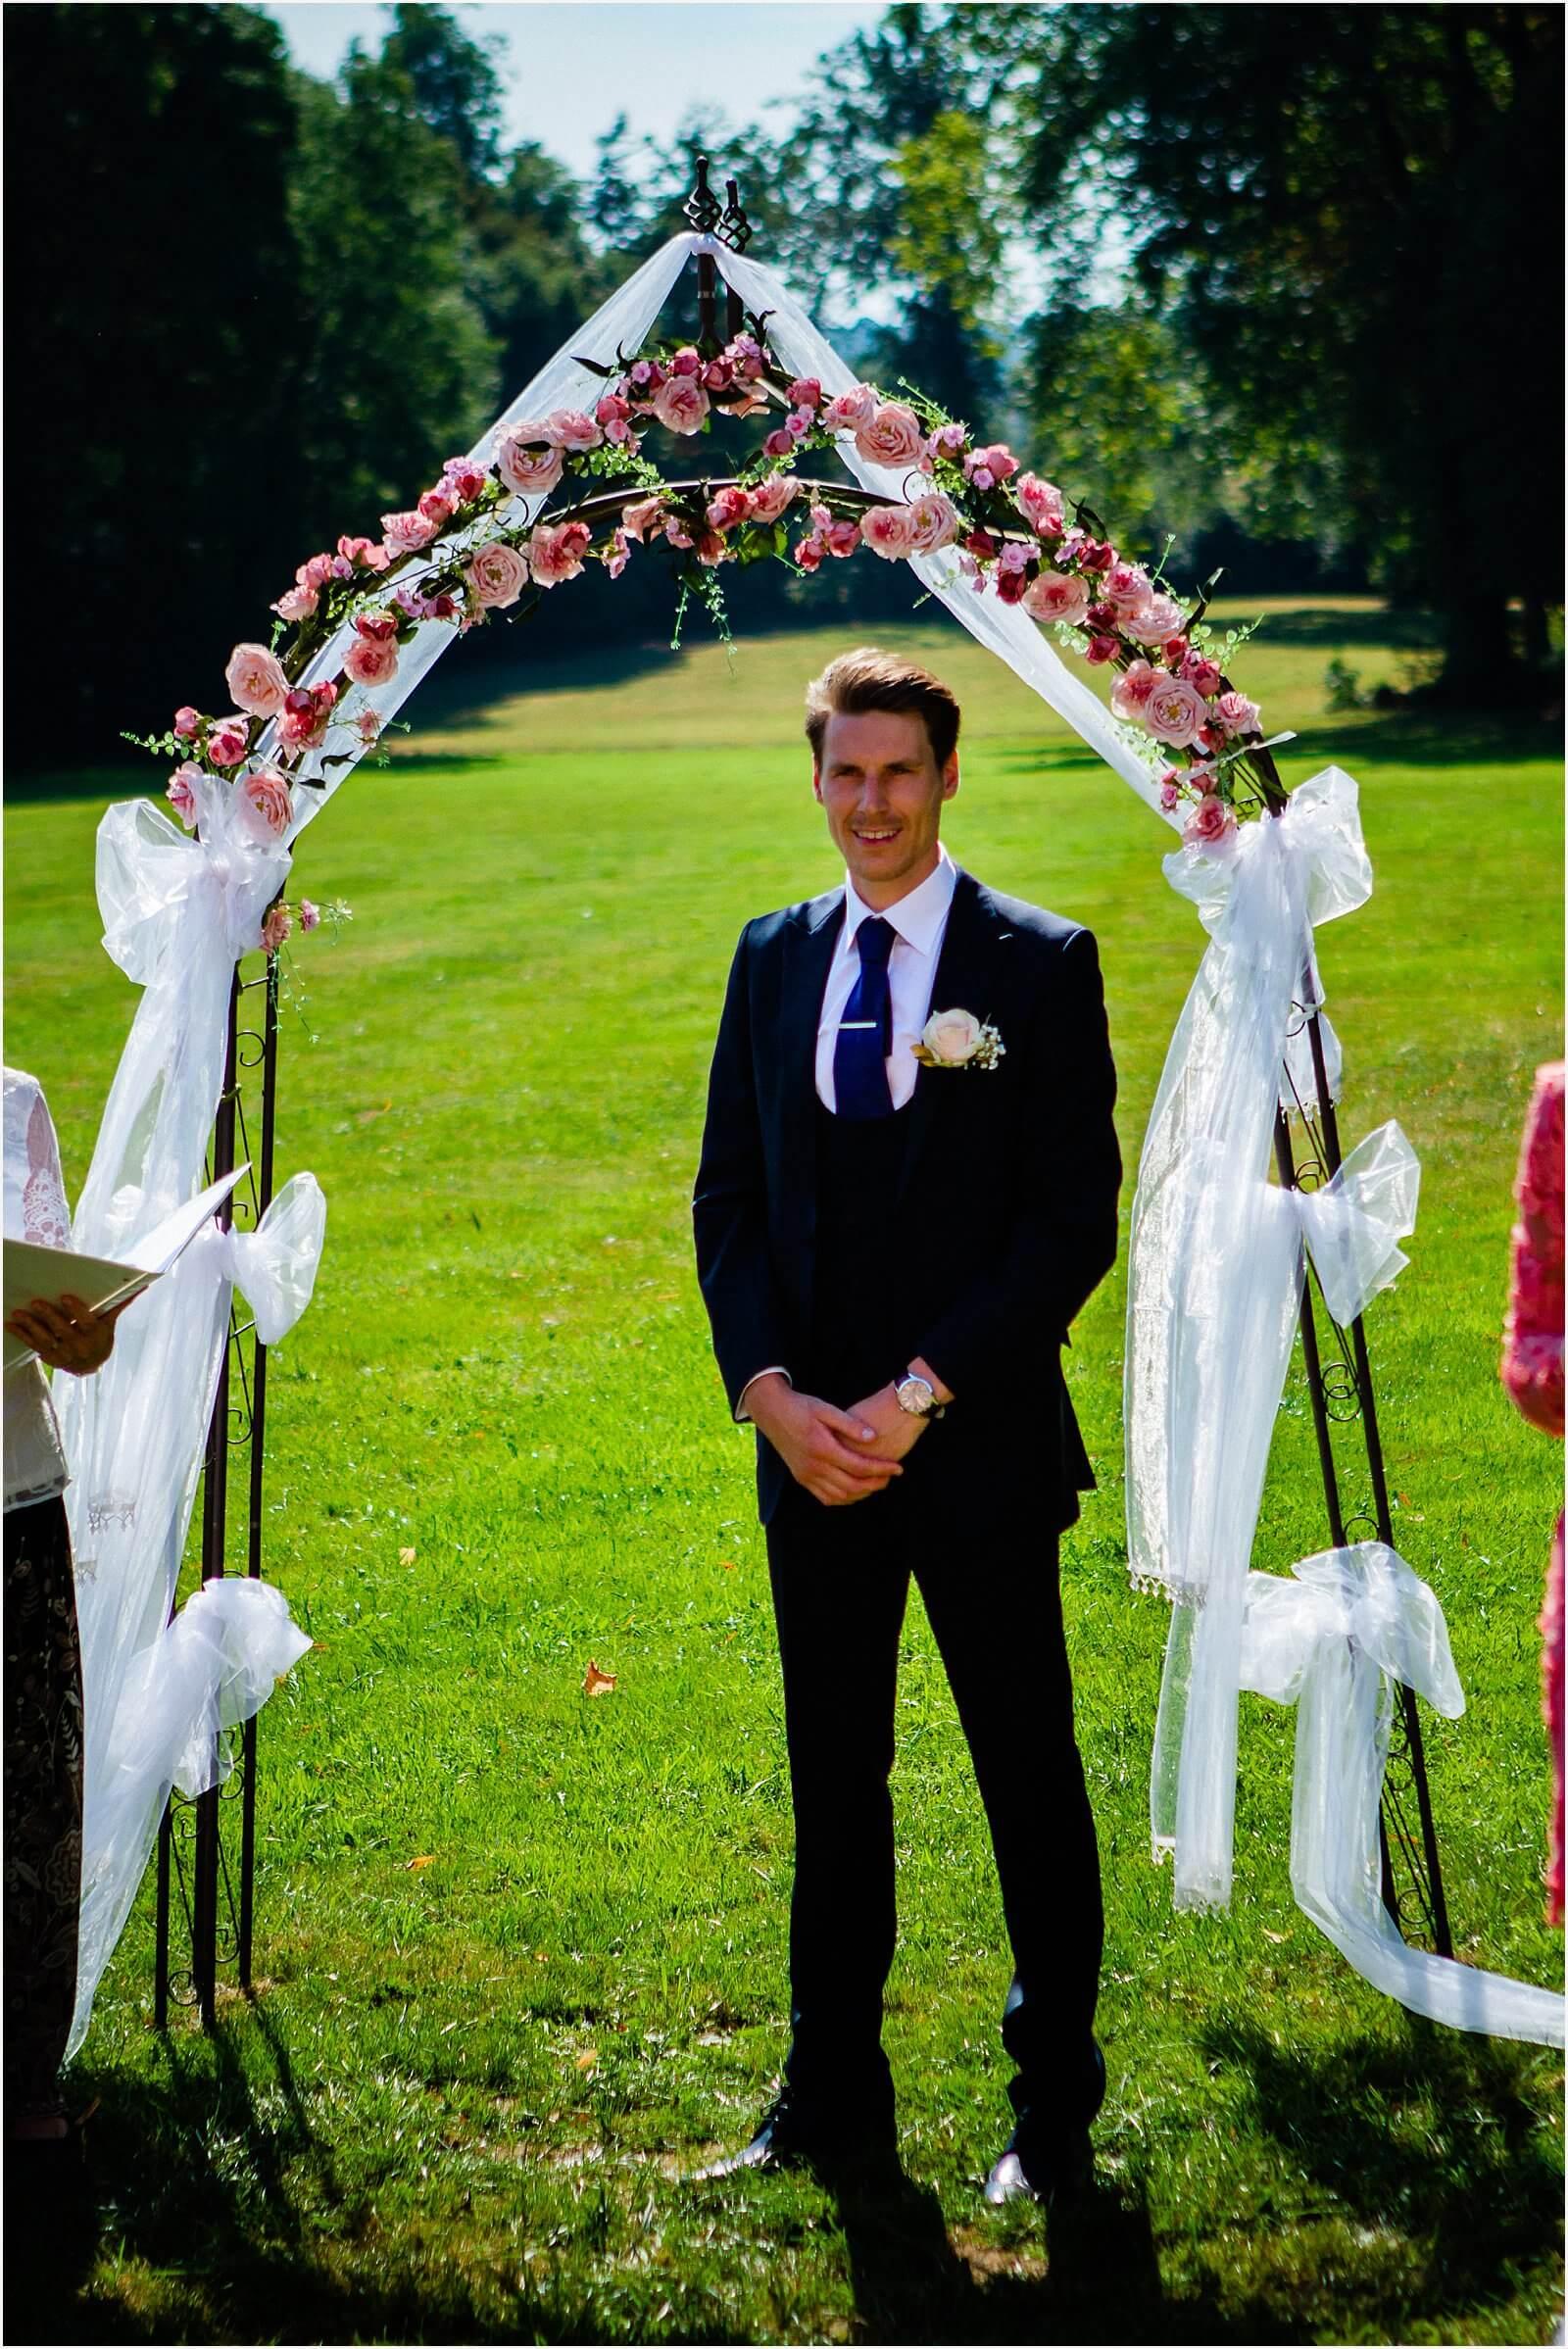 Chateau de Courtomer Wedding | Chantel & Evan 23